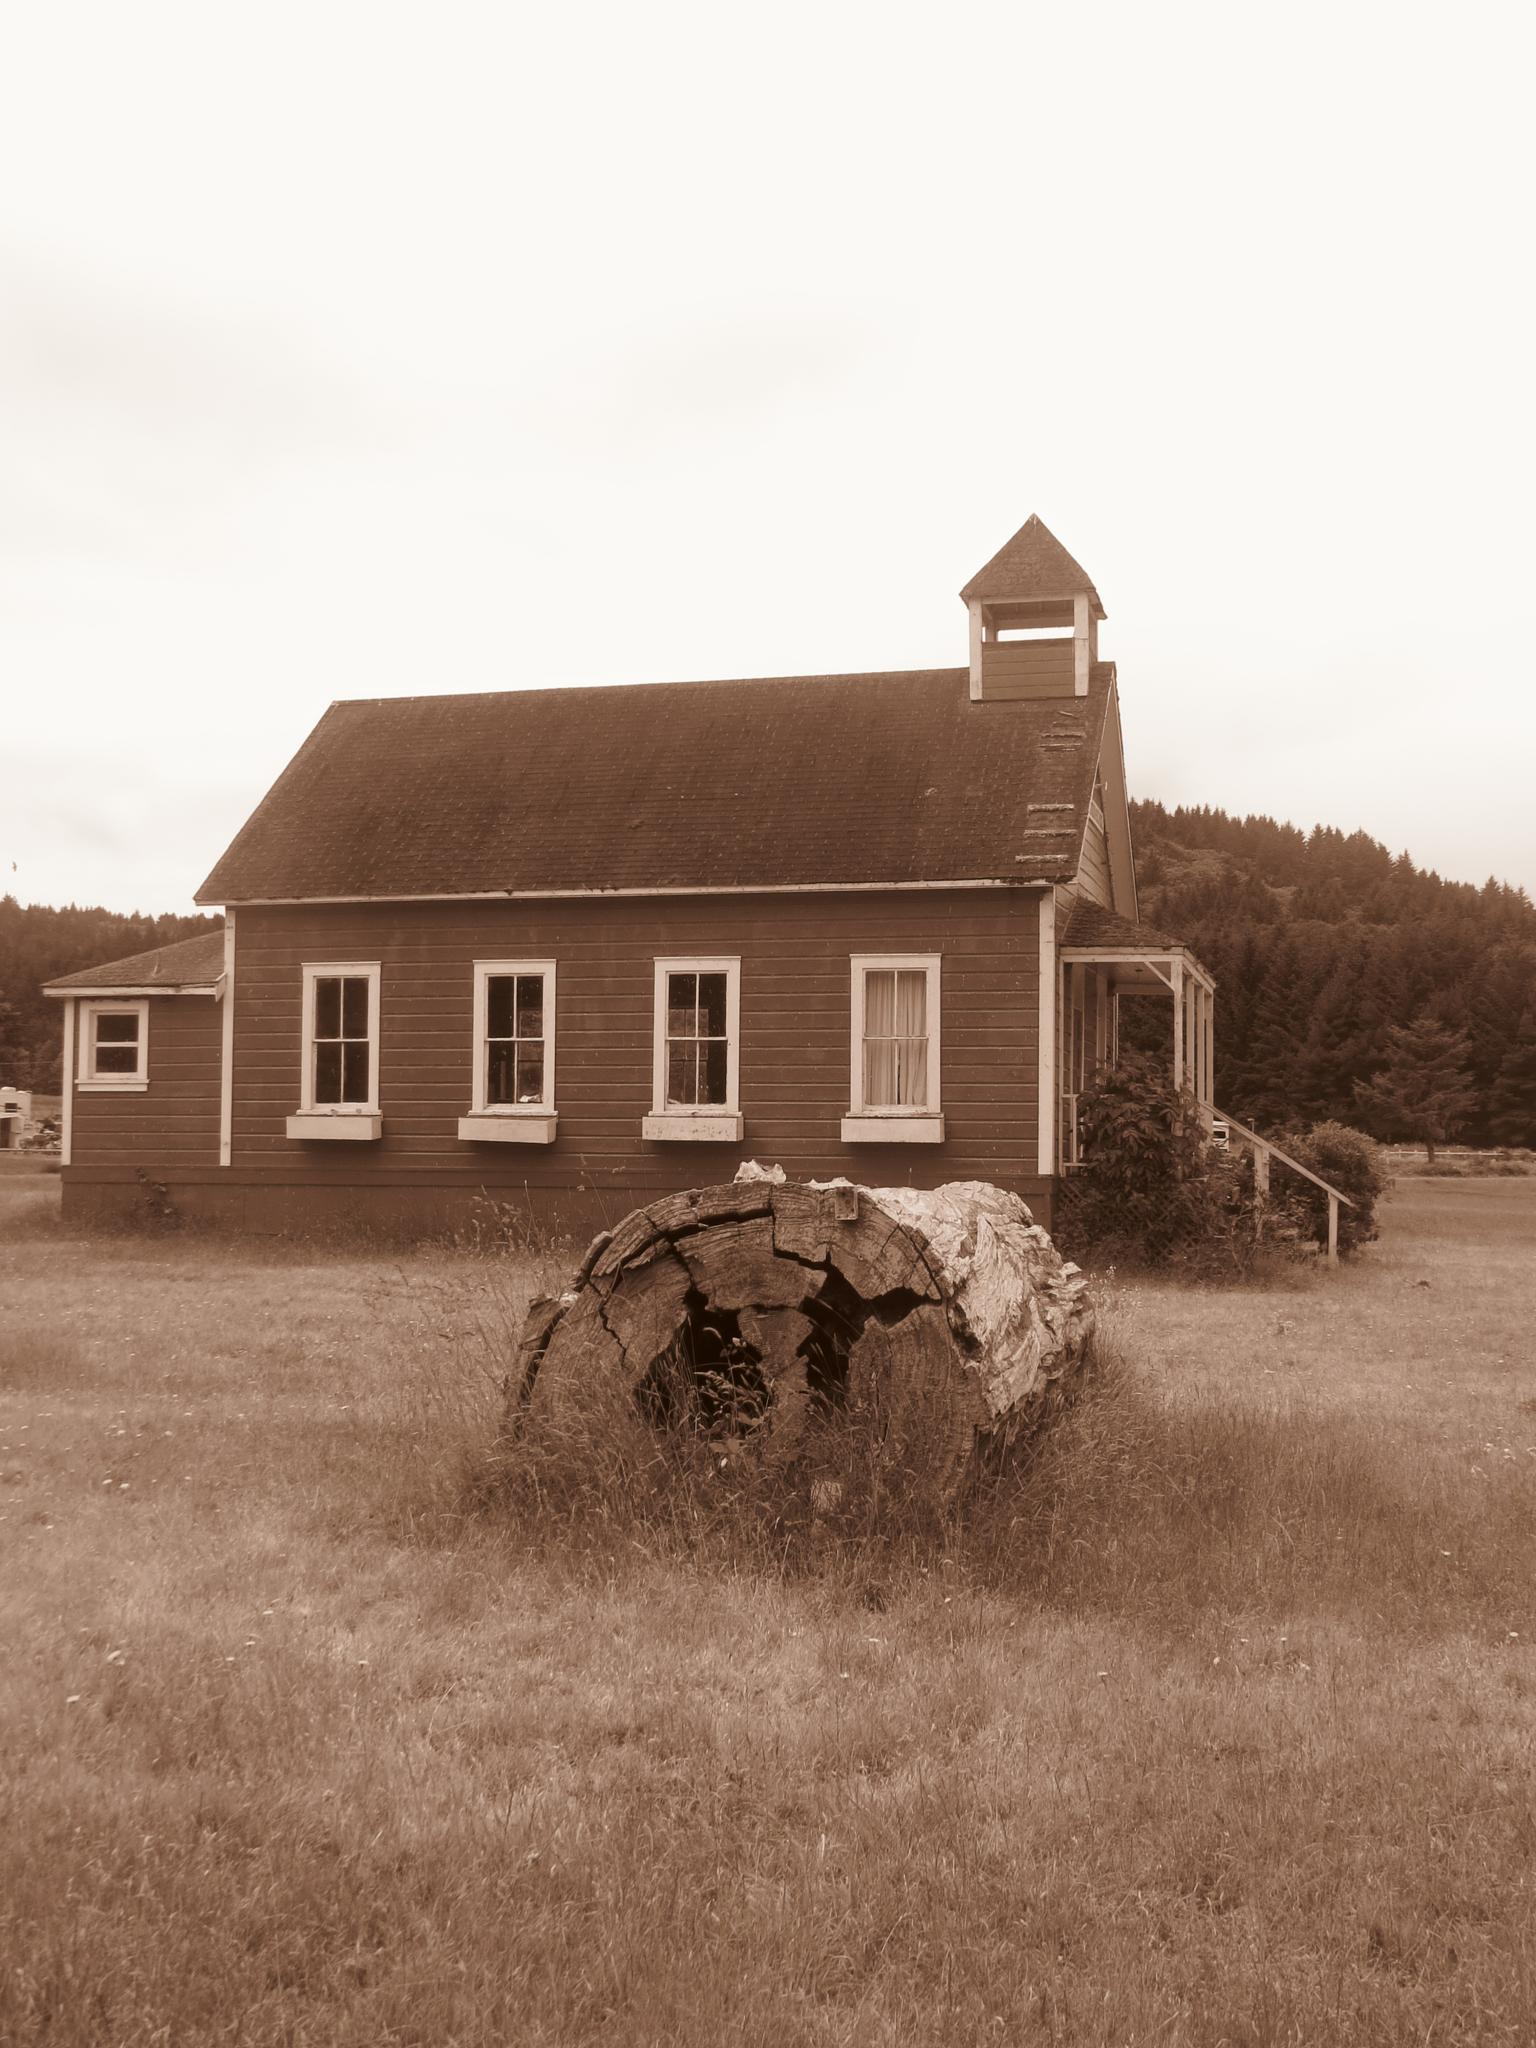 Stone Lagoon School House by christine.rayburn.167